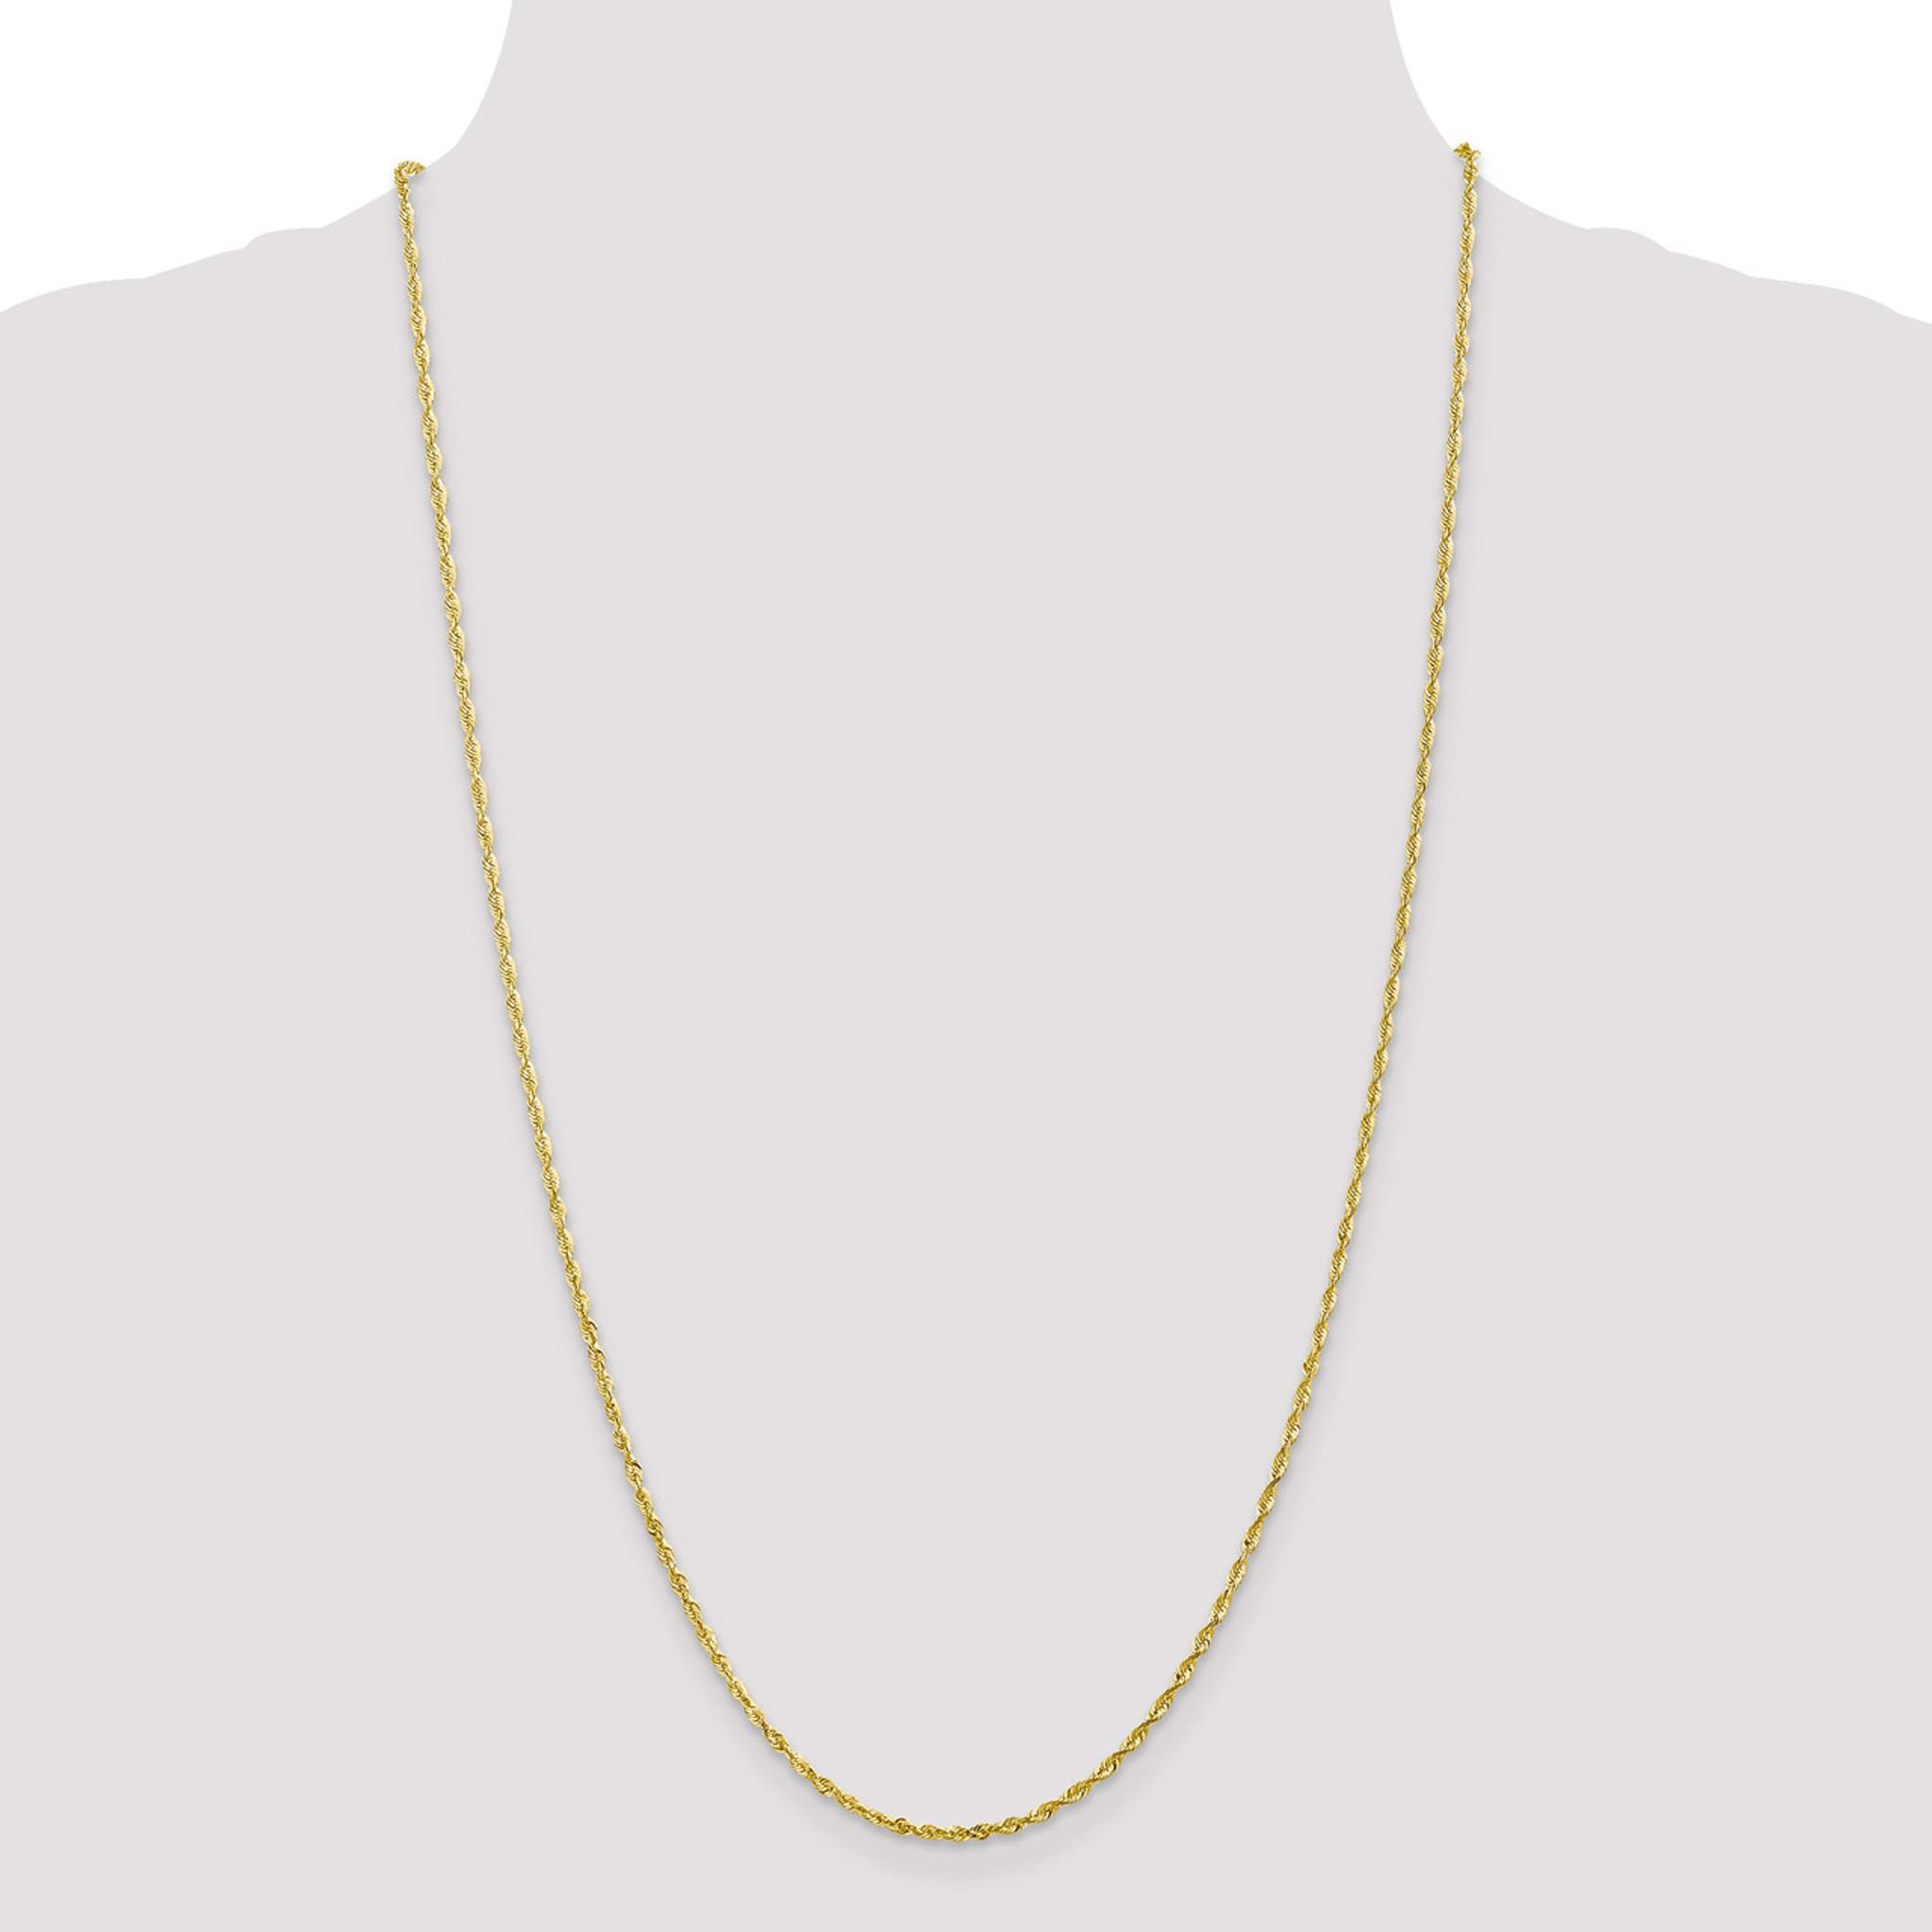 10k 2.0mm Diamond-Cut Extra-Lite Rope Chain